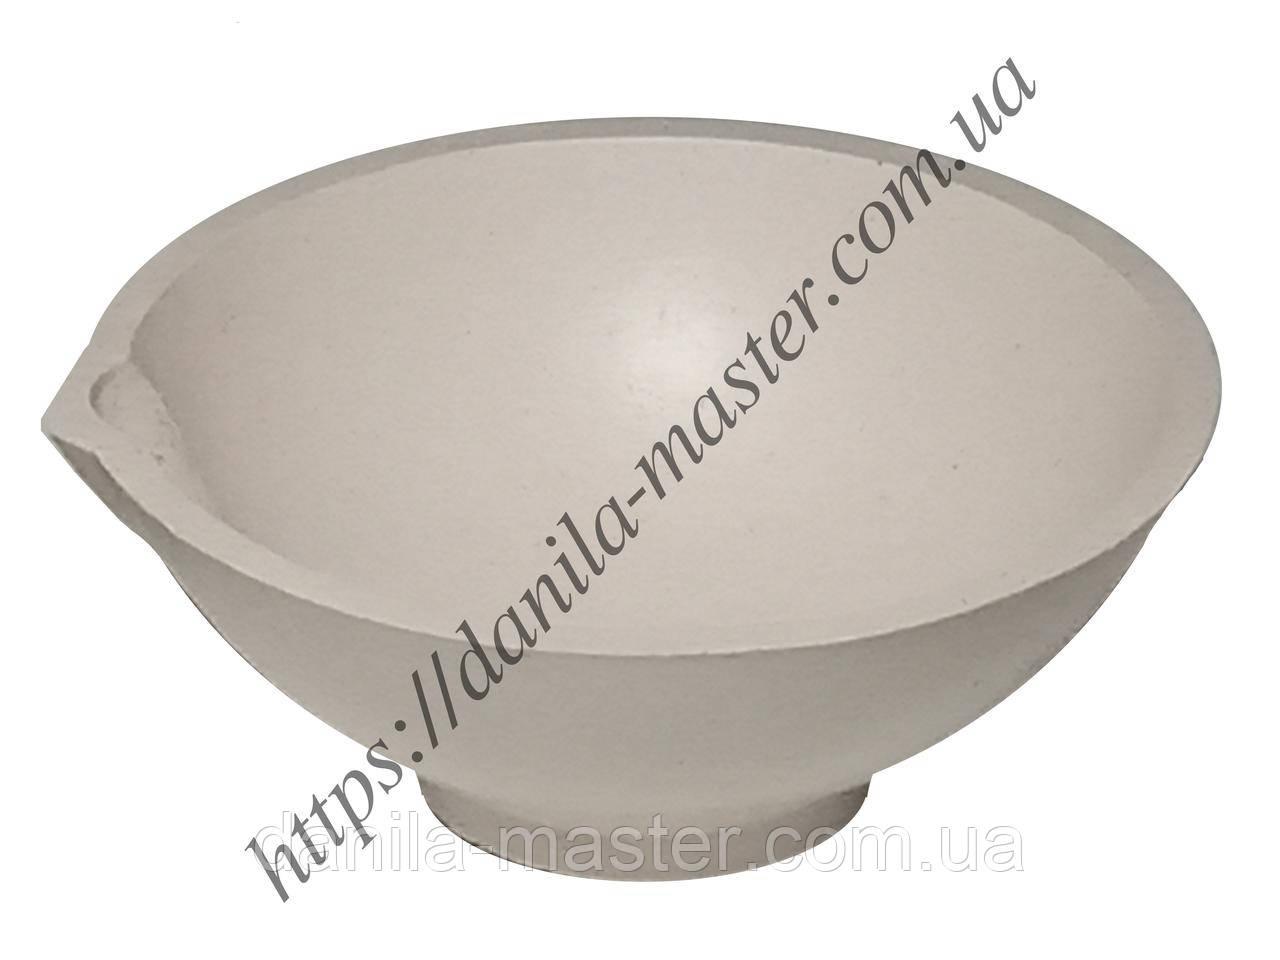 Тигель шамотно-глиняный №6 /Ø70 мм., h=27 мм./